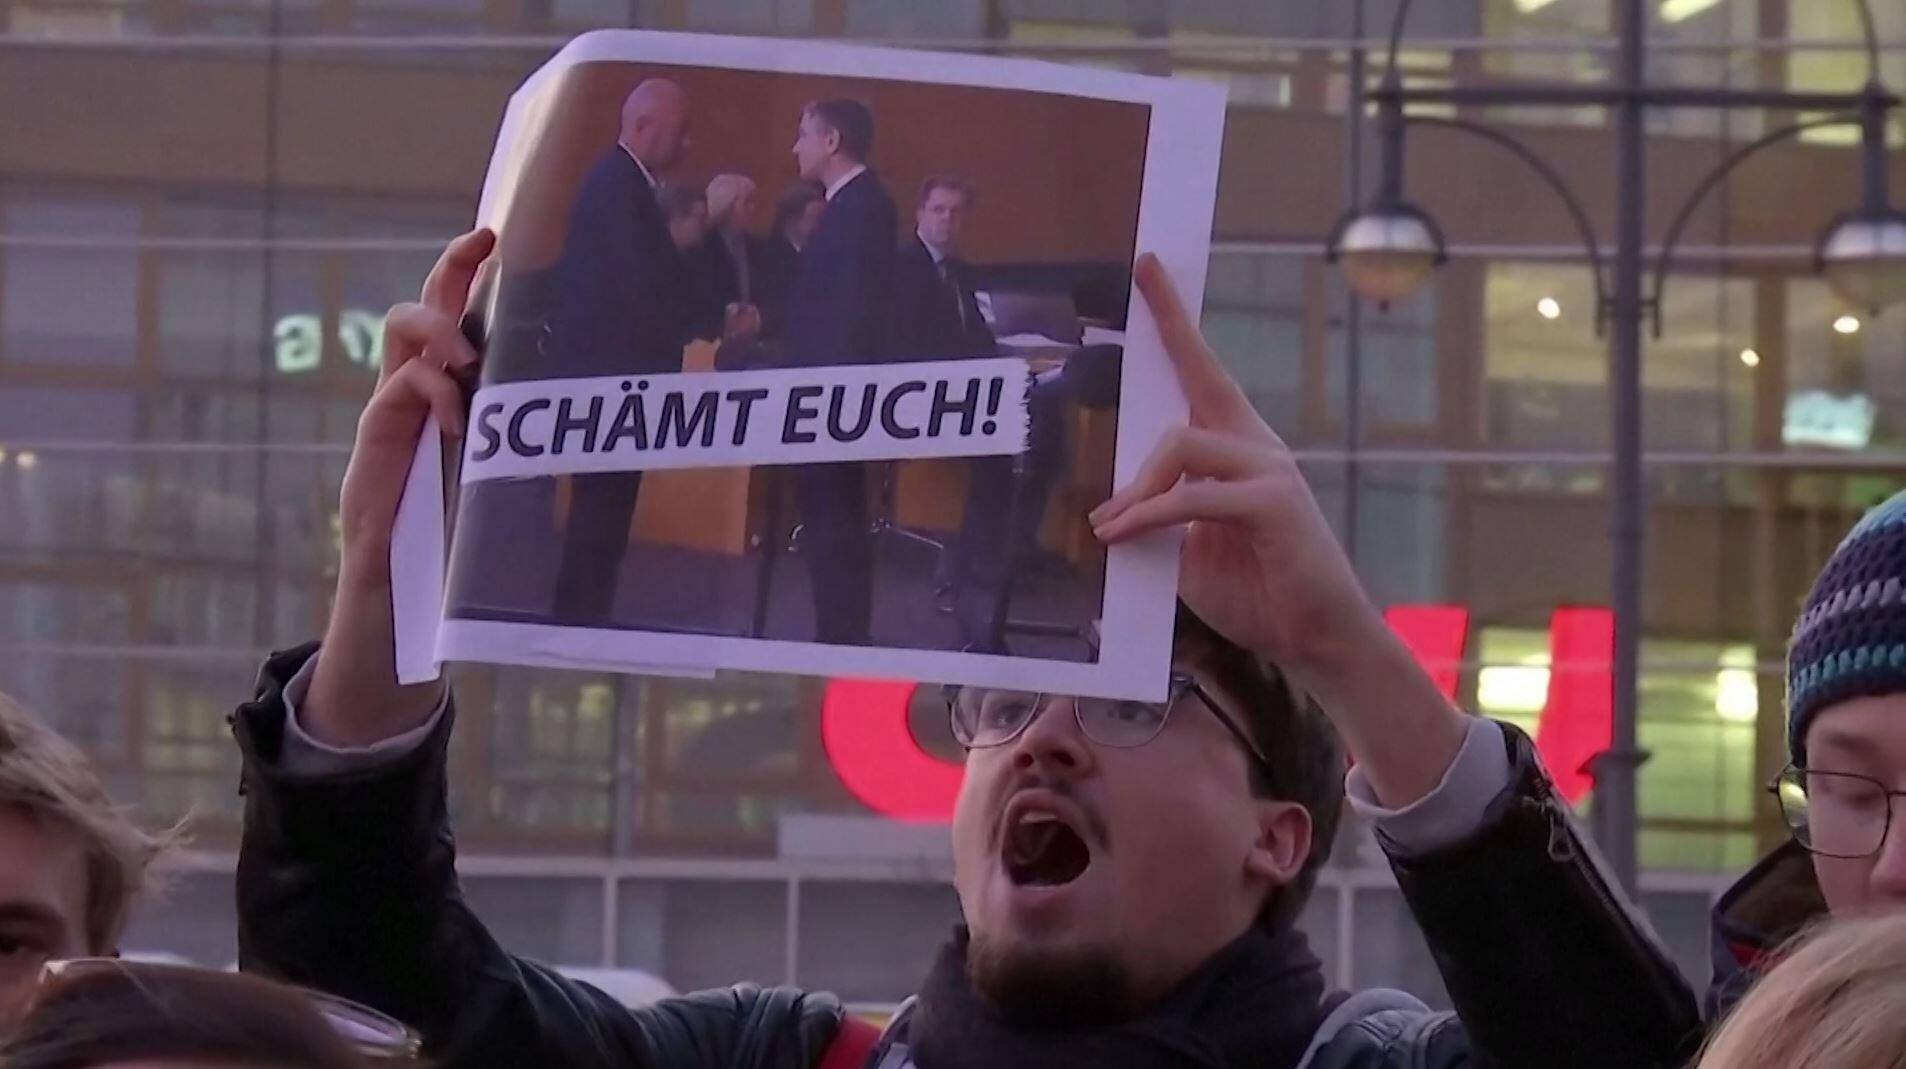 Bild zu Proteste gegen Ministerpräsidenten-Wahl in Thüringen